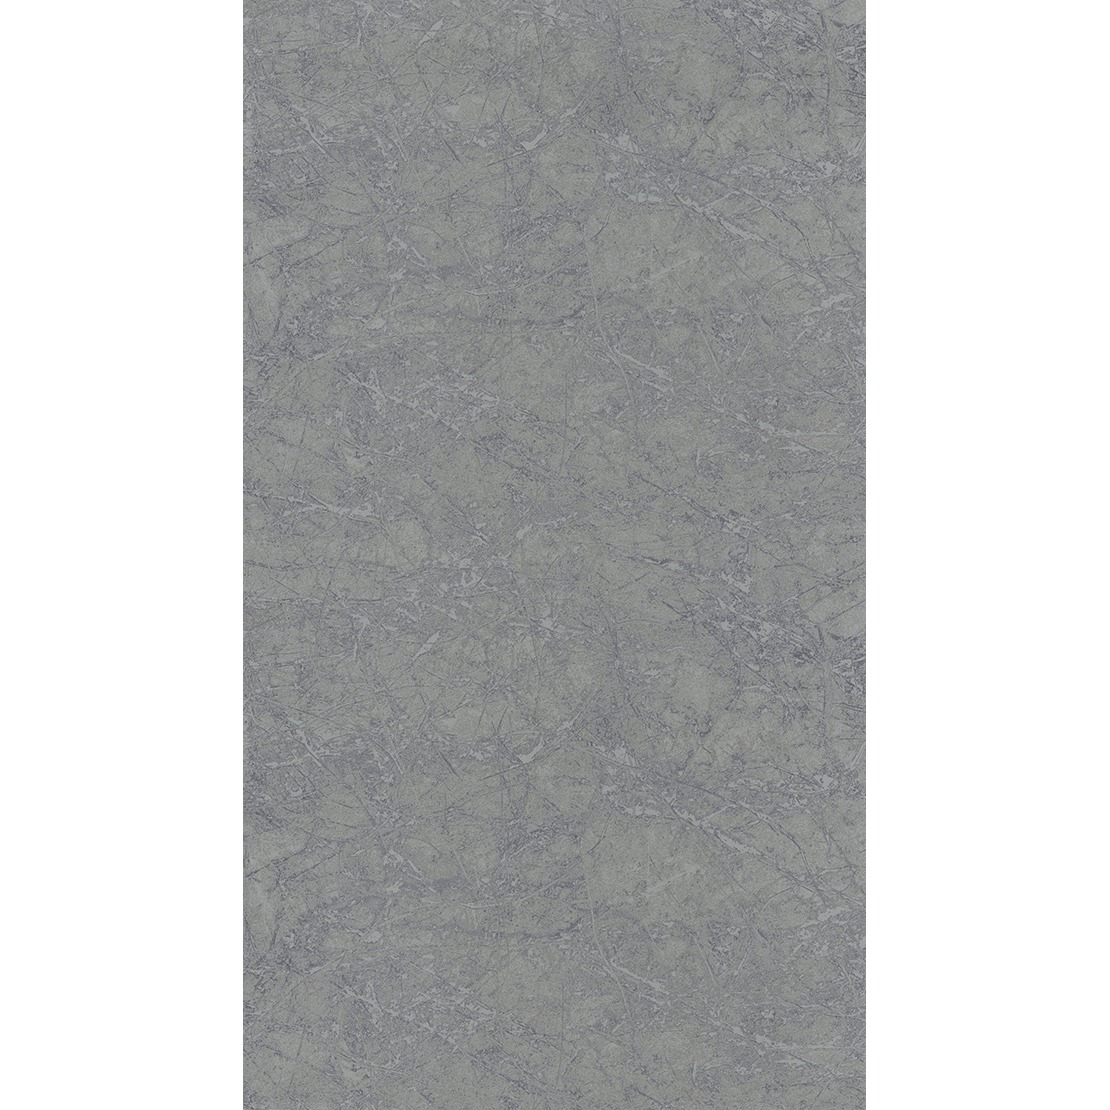 Французские обои Casadeco,  коллекция Oxyde, артикулOXY29129220